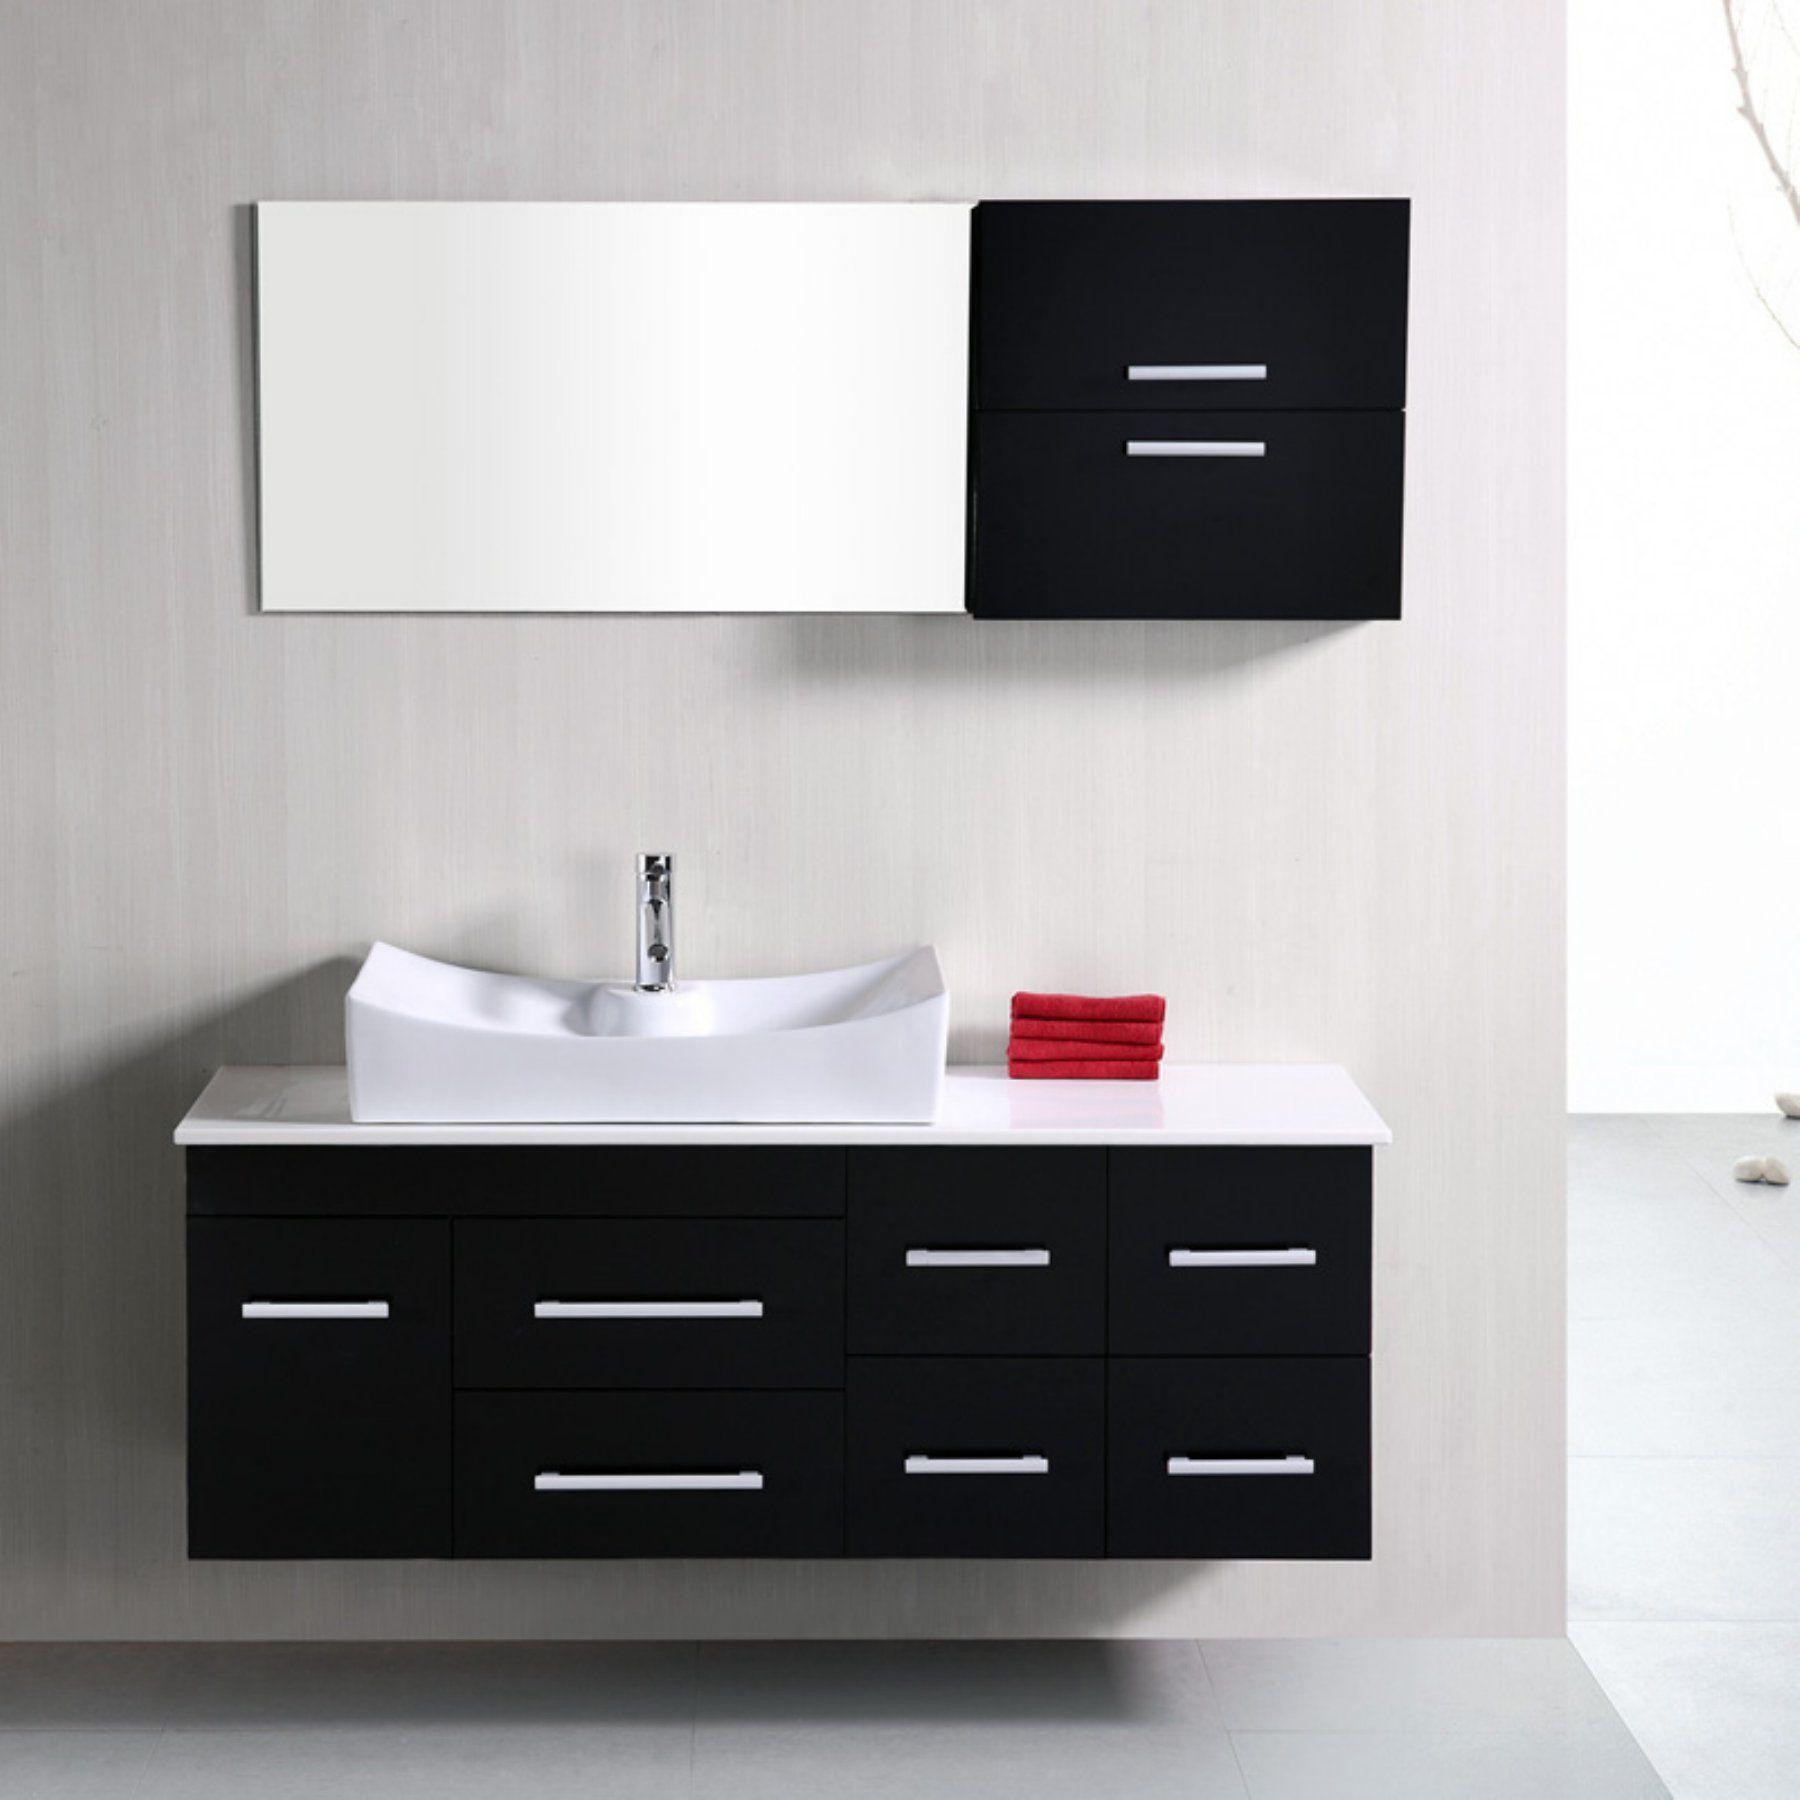 Design Element Dec1101 Springfield 53 In Single Bathroom Vanity